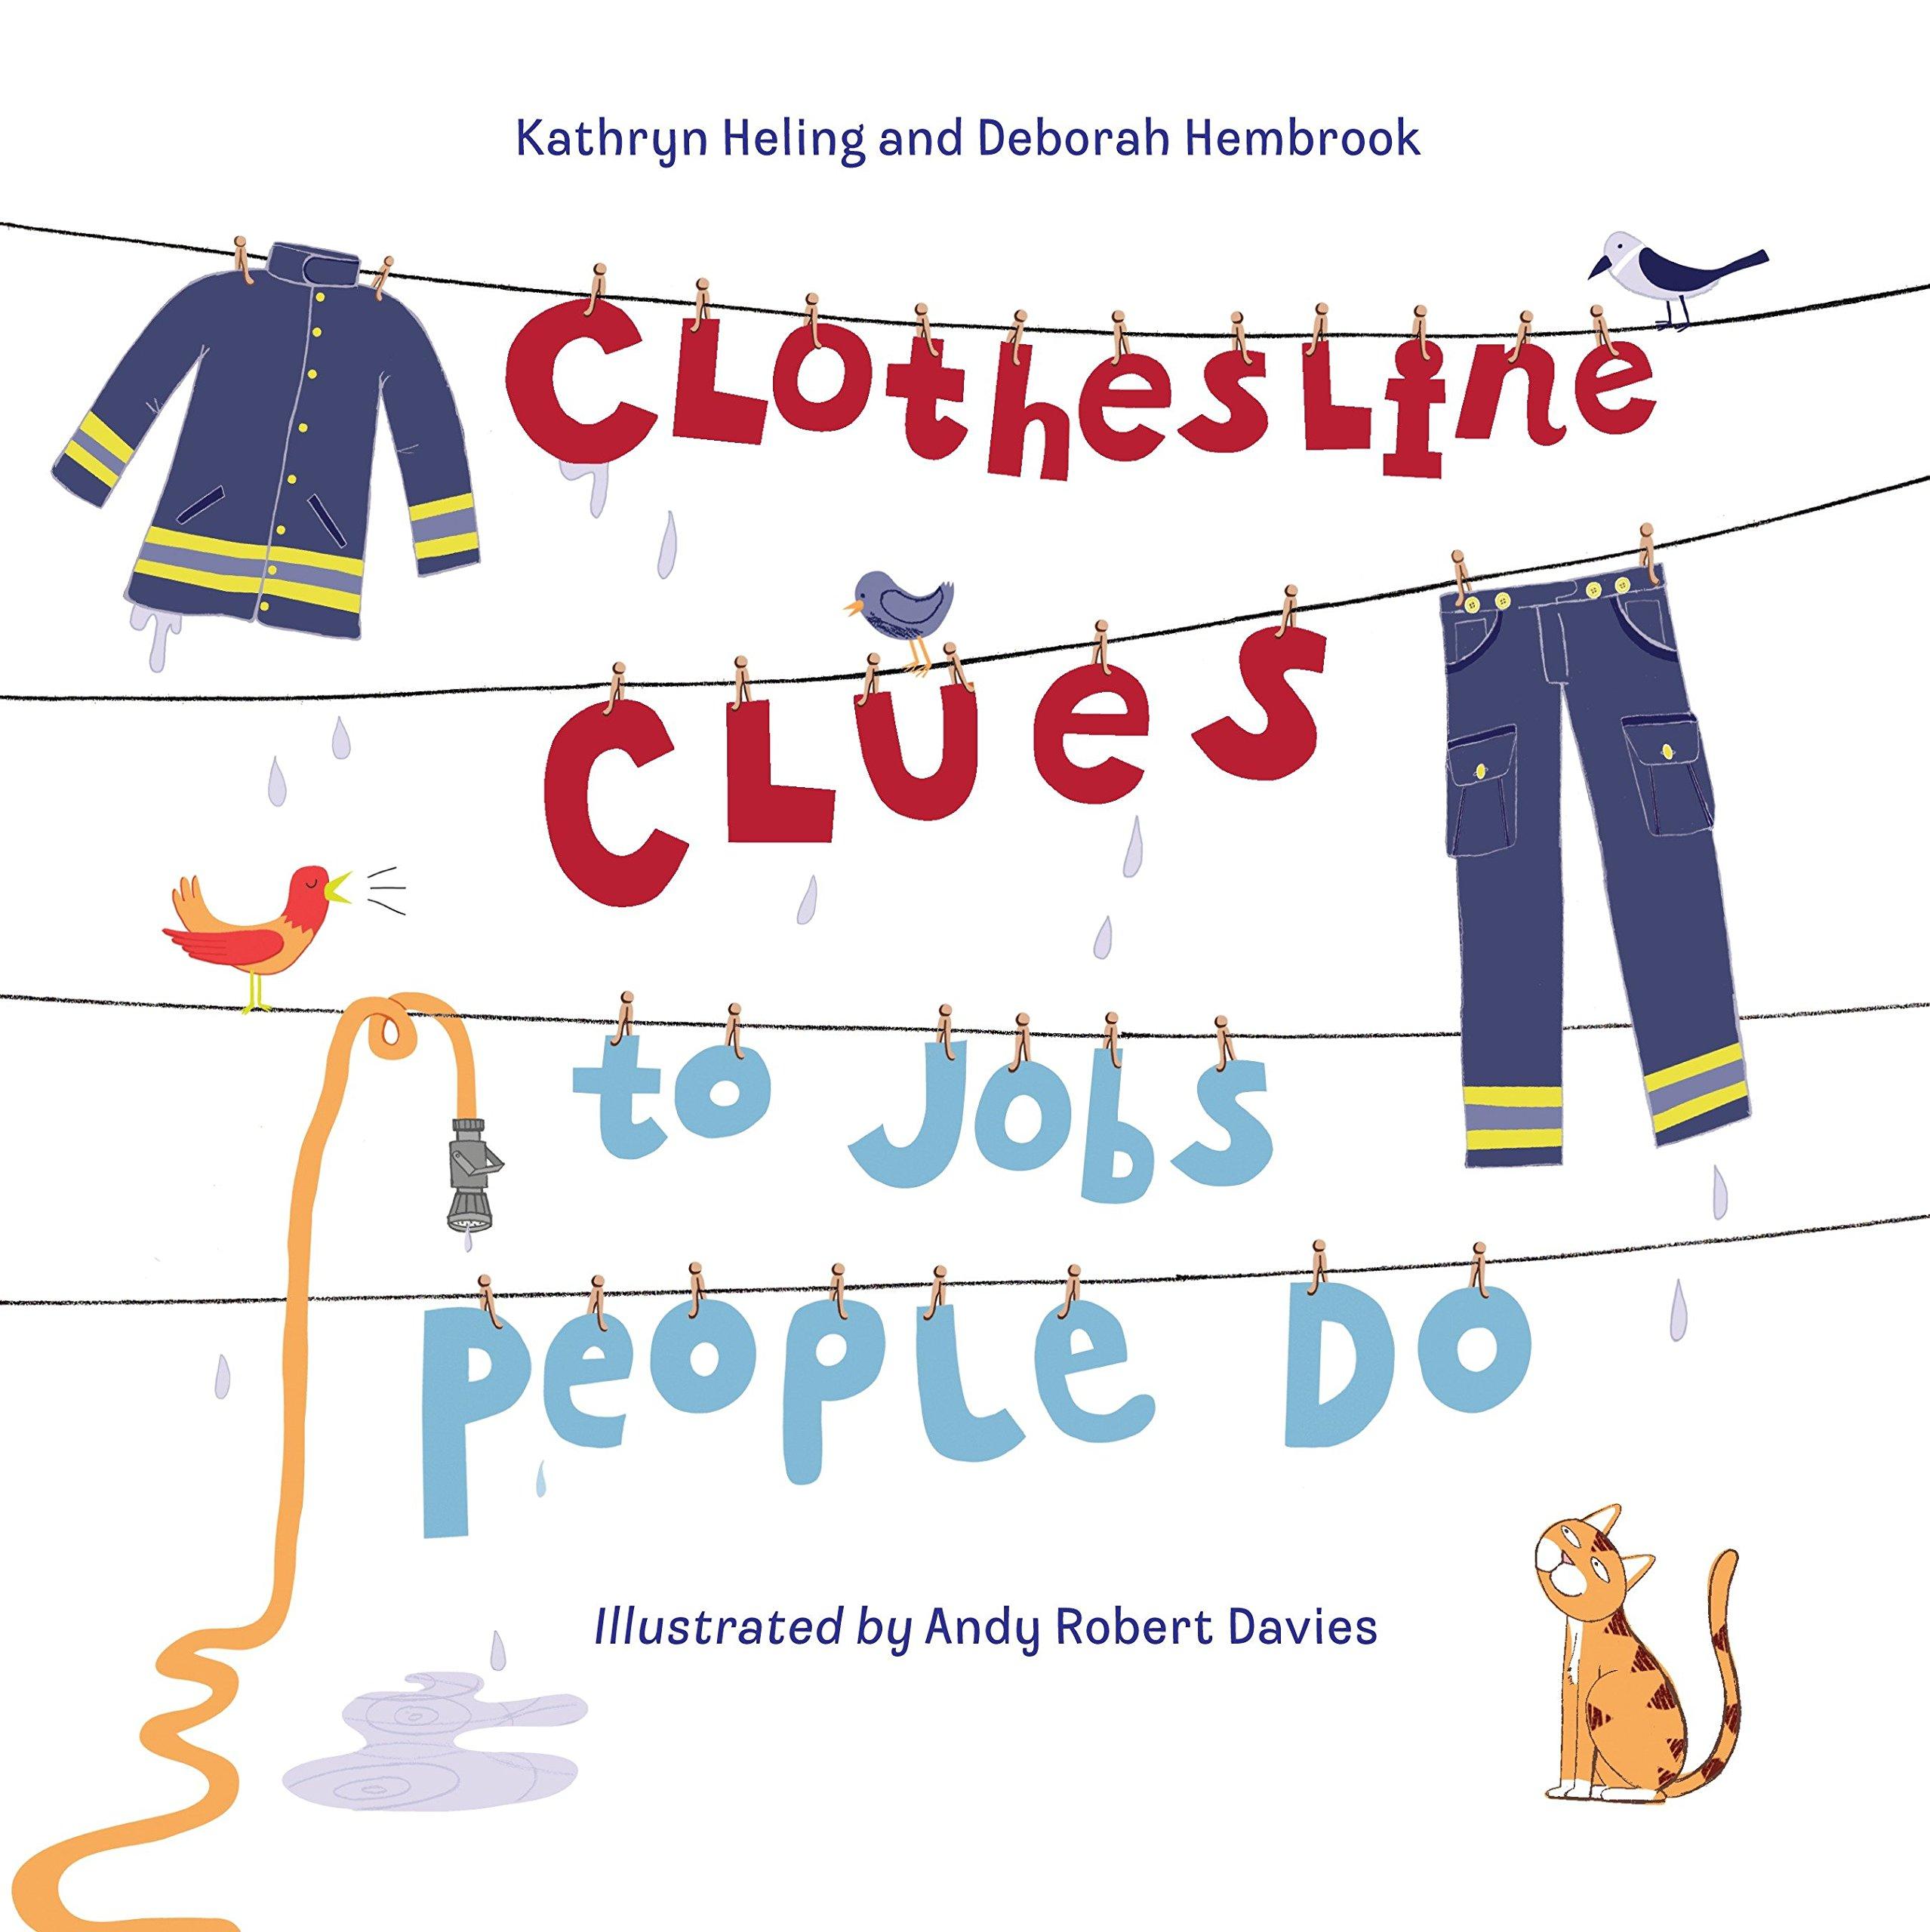 Clothesline Clues Jobs People Do